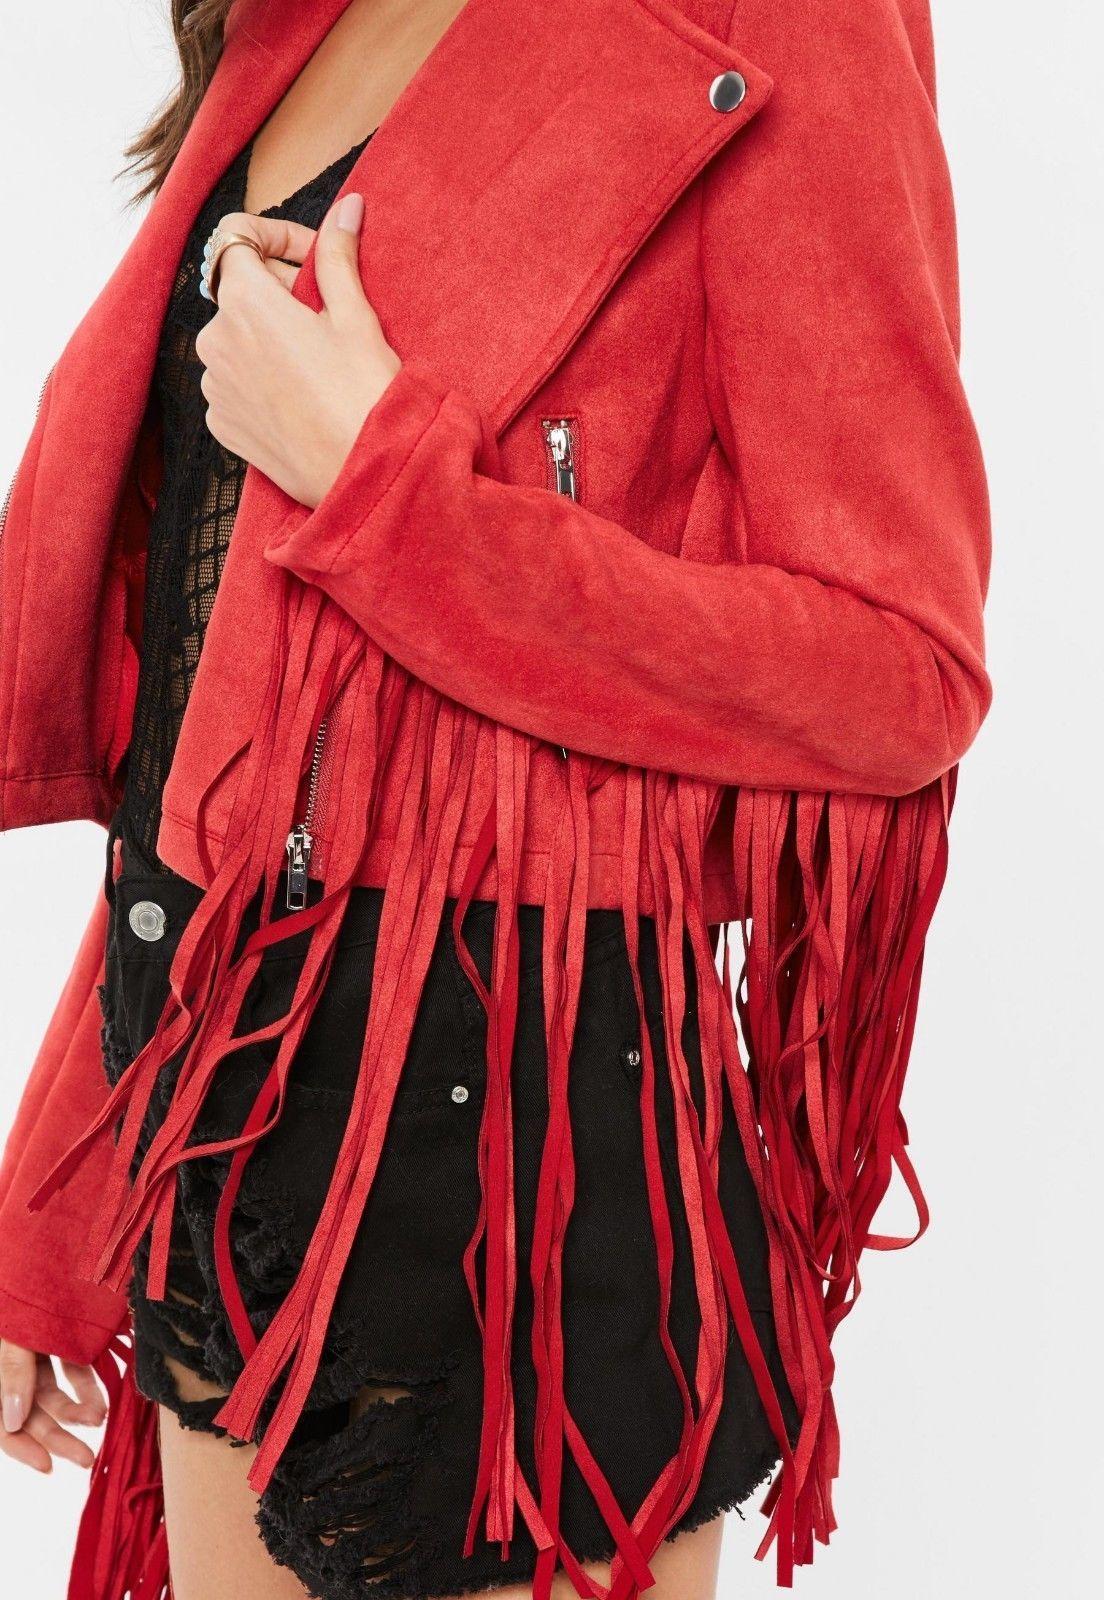 WOMEN'S NEW POPULAR RED WESTERN FRINGES SUEDE LEATHER BOHO HIPPY JACKET WJ125R image 6